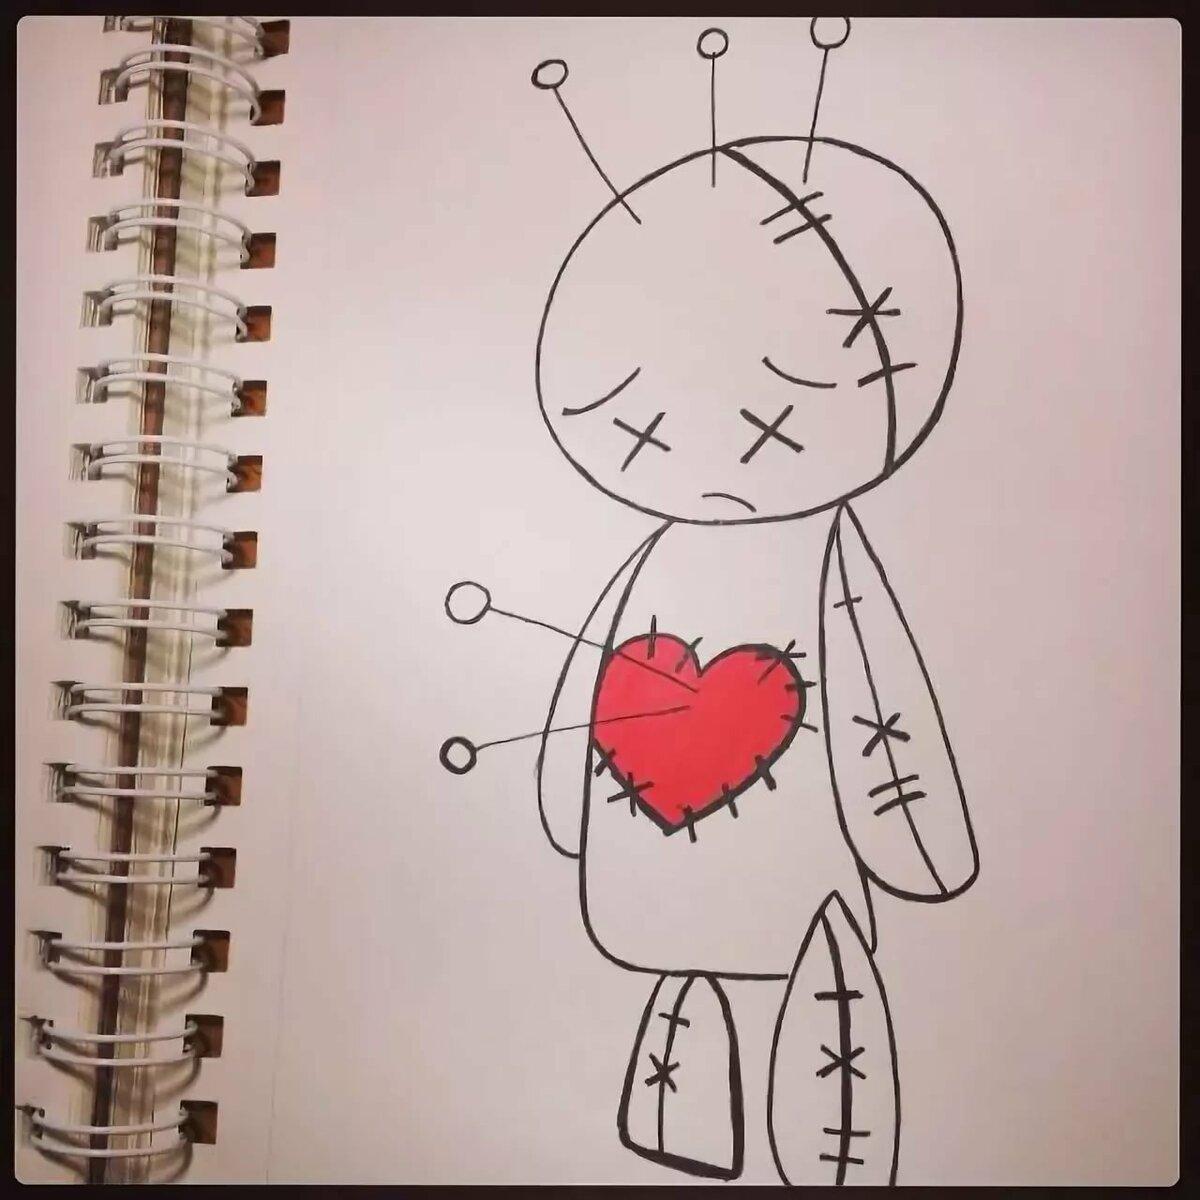 Картинки стихи, рисунок для любимого карандашом